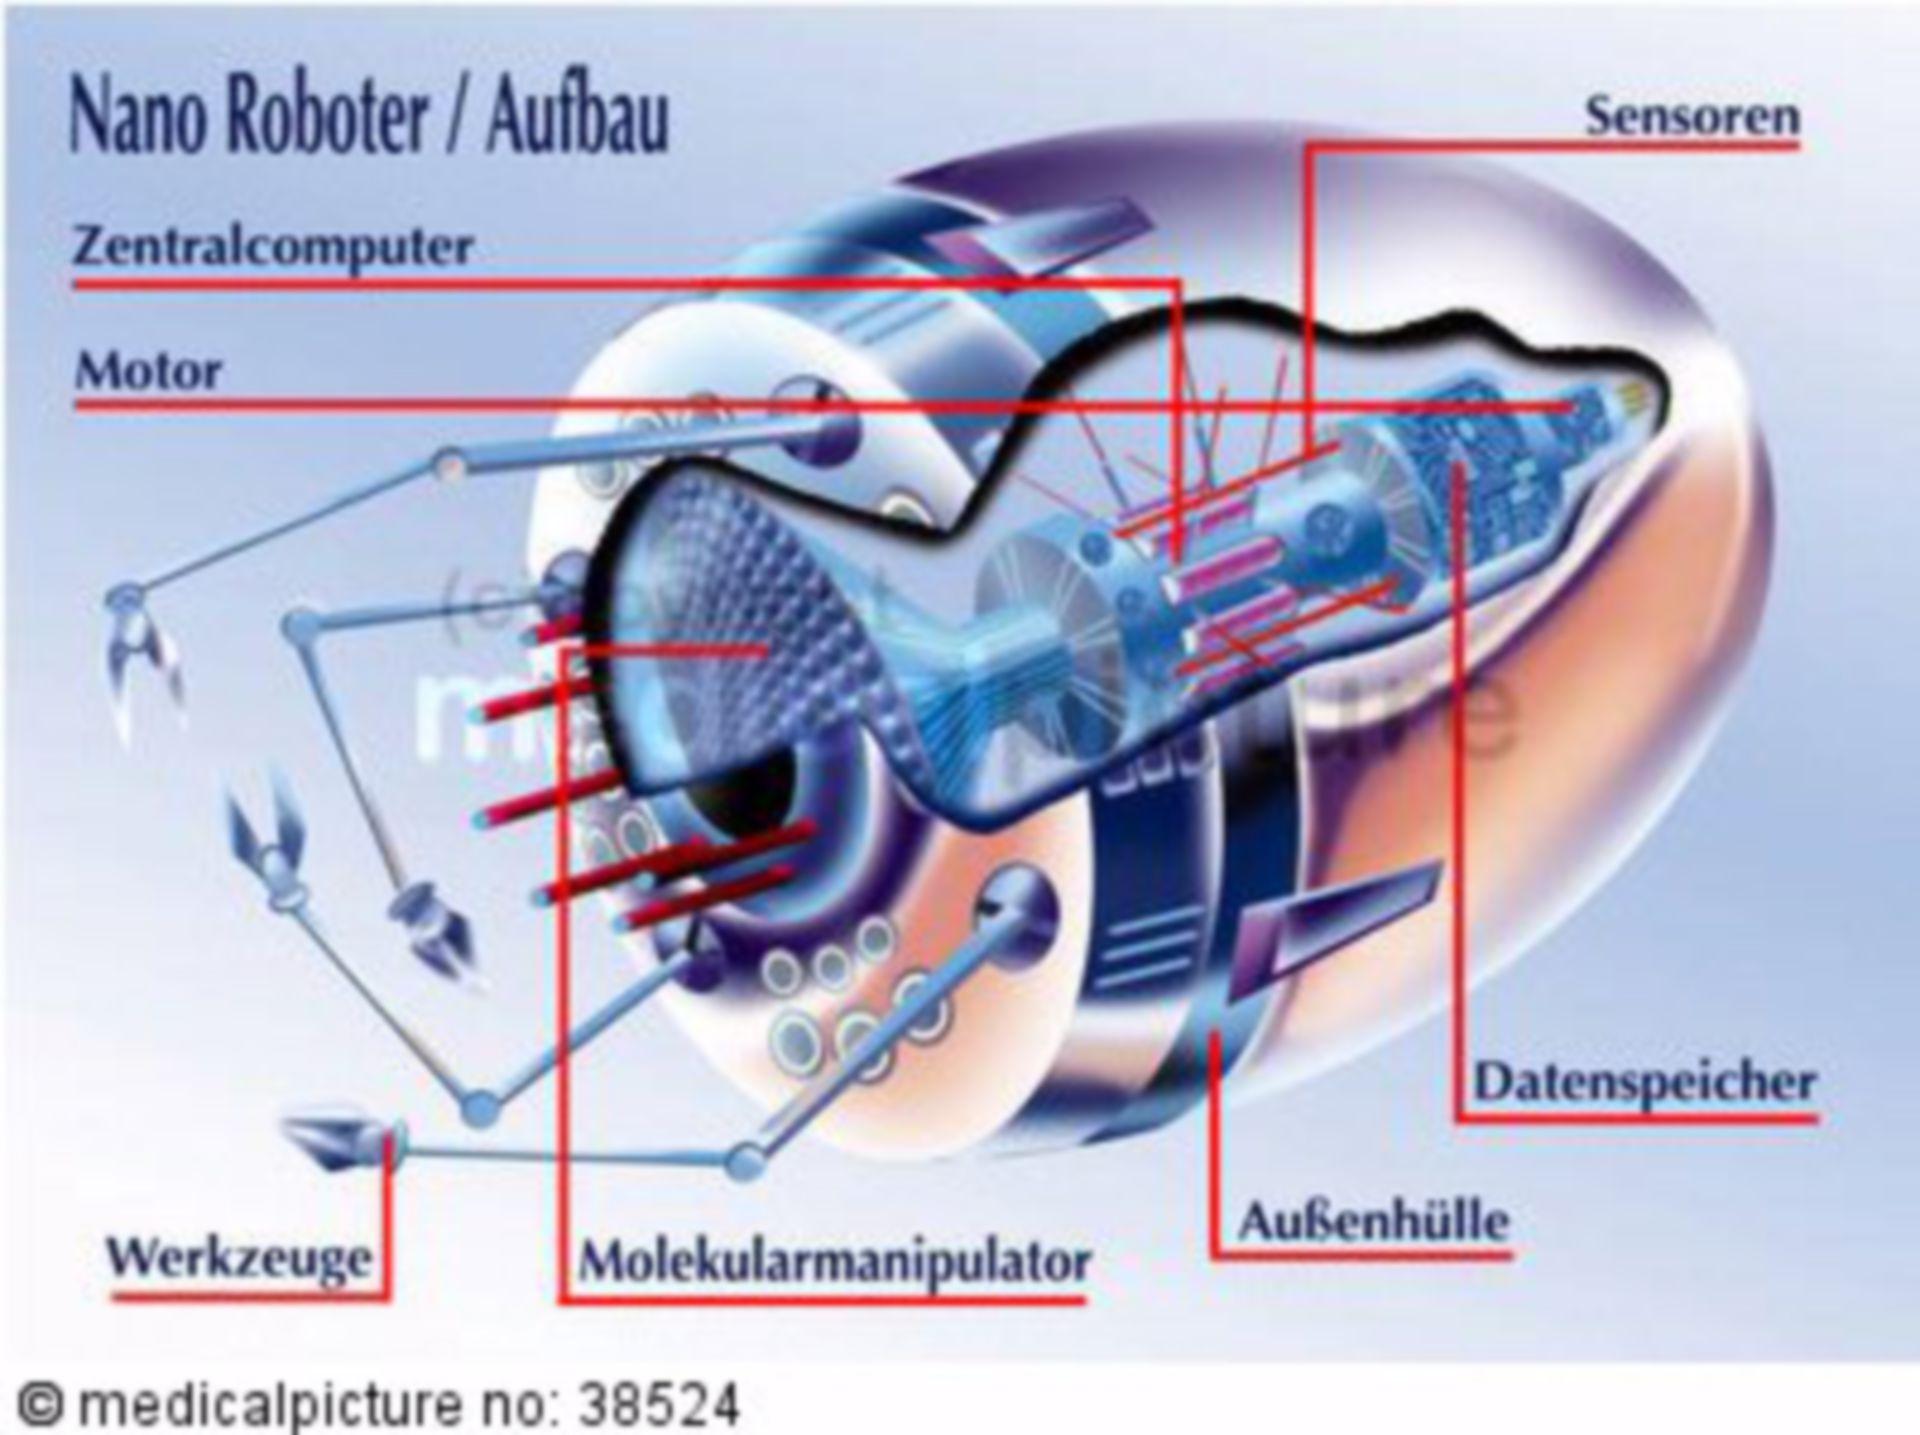 Aufbau eines Nanoroboters